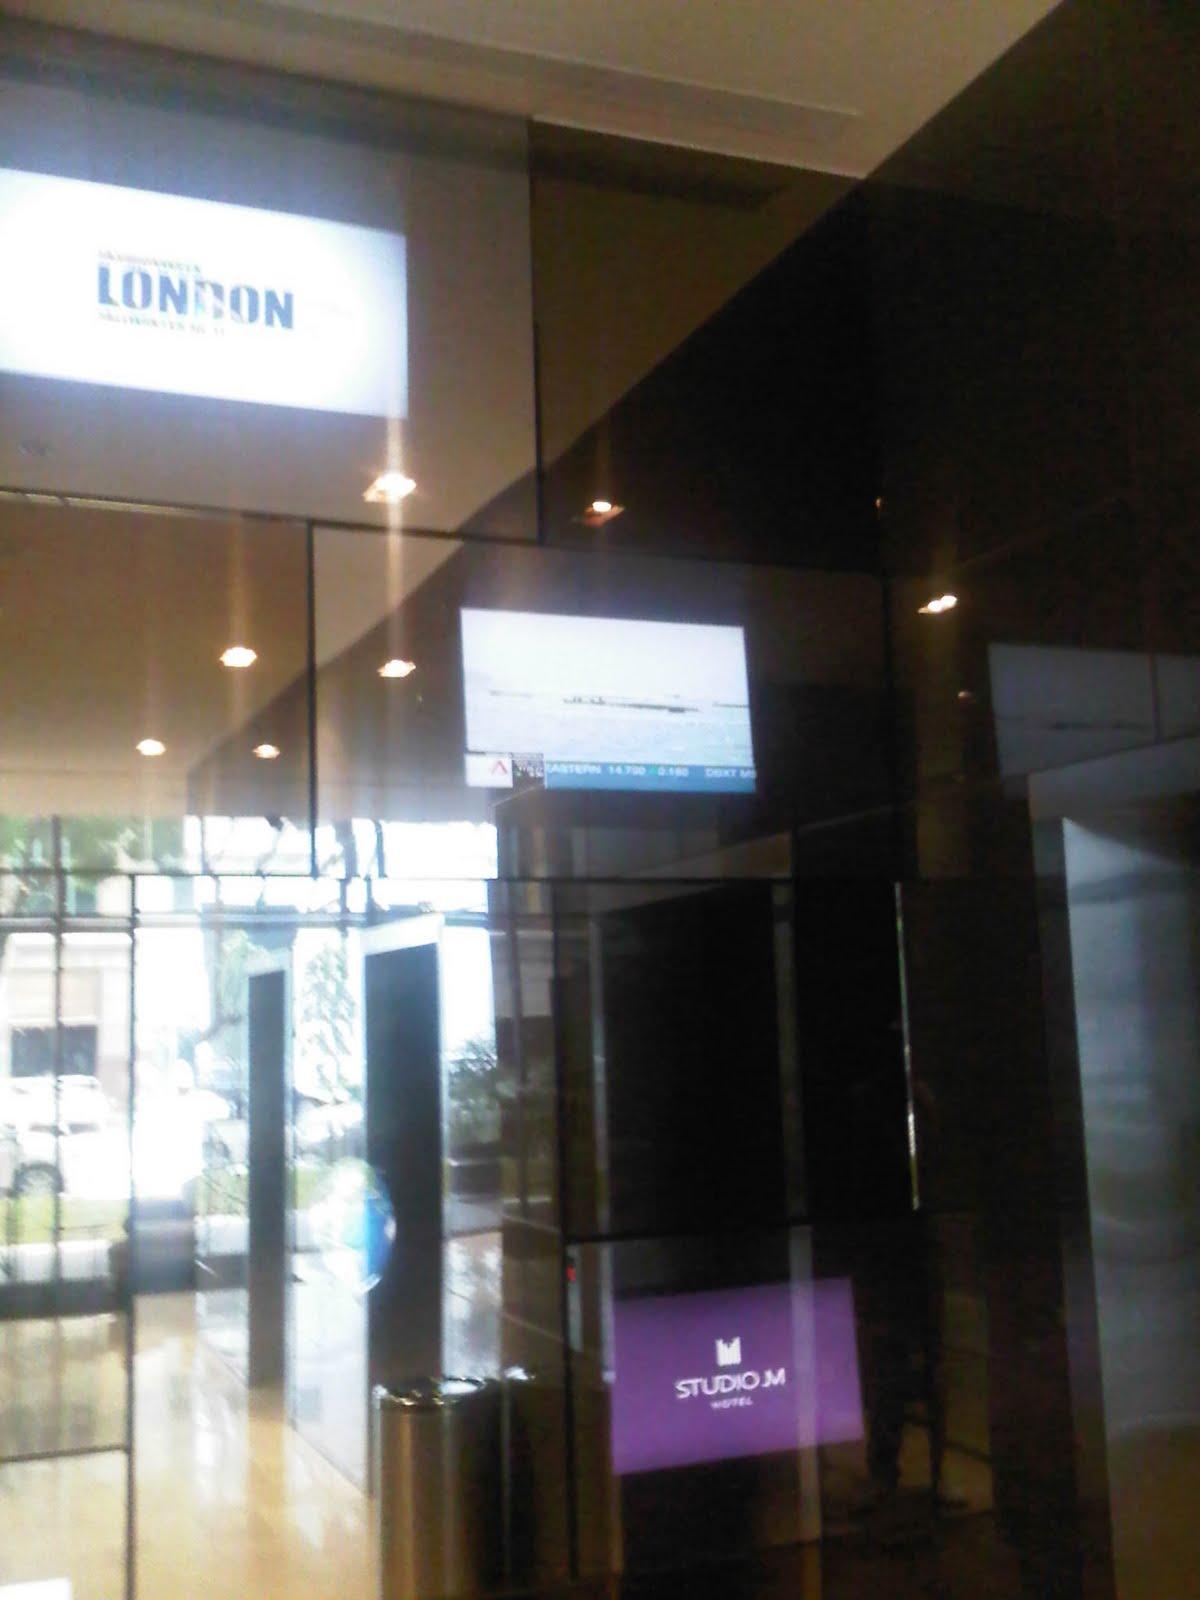 M fusion the digital signage people feature mirror tv for studio m hotel singapore - Studio m ...